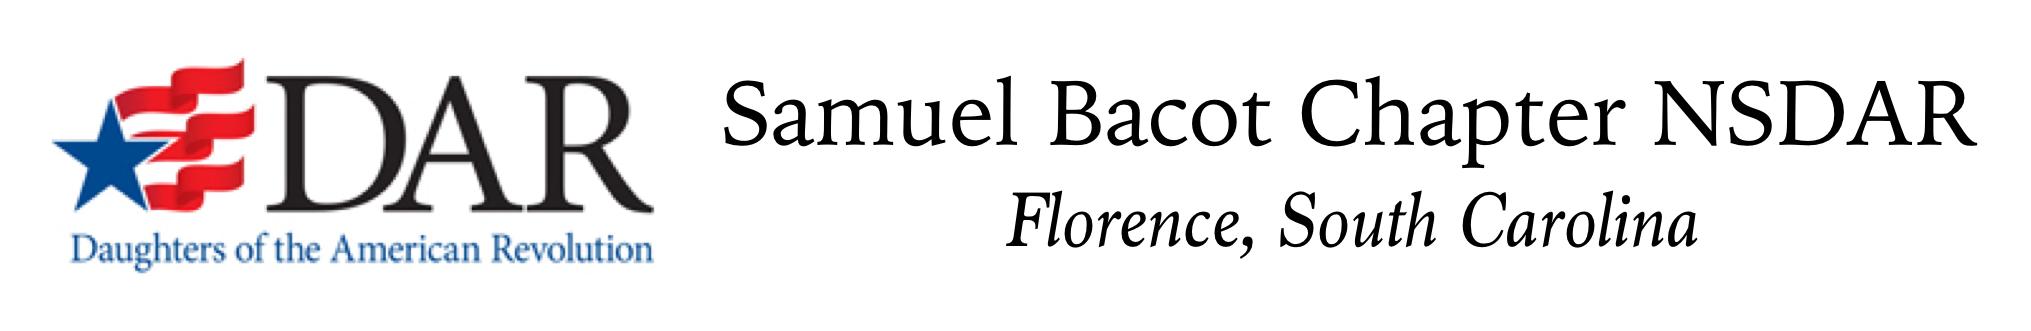 Samuel Bacot Banner.png